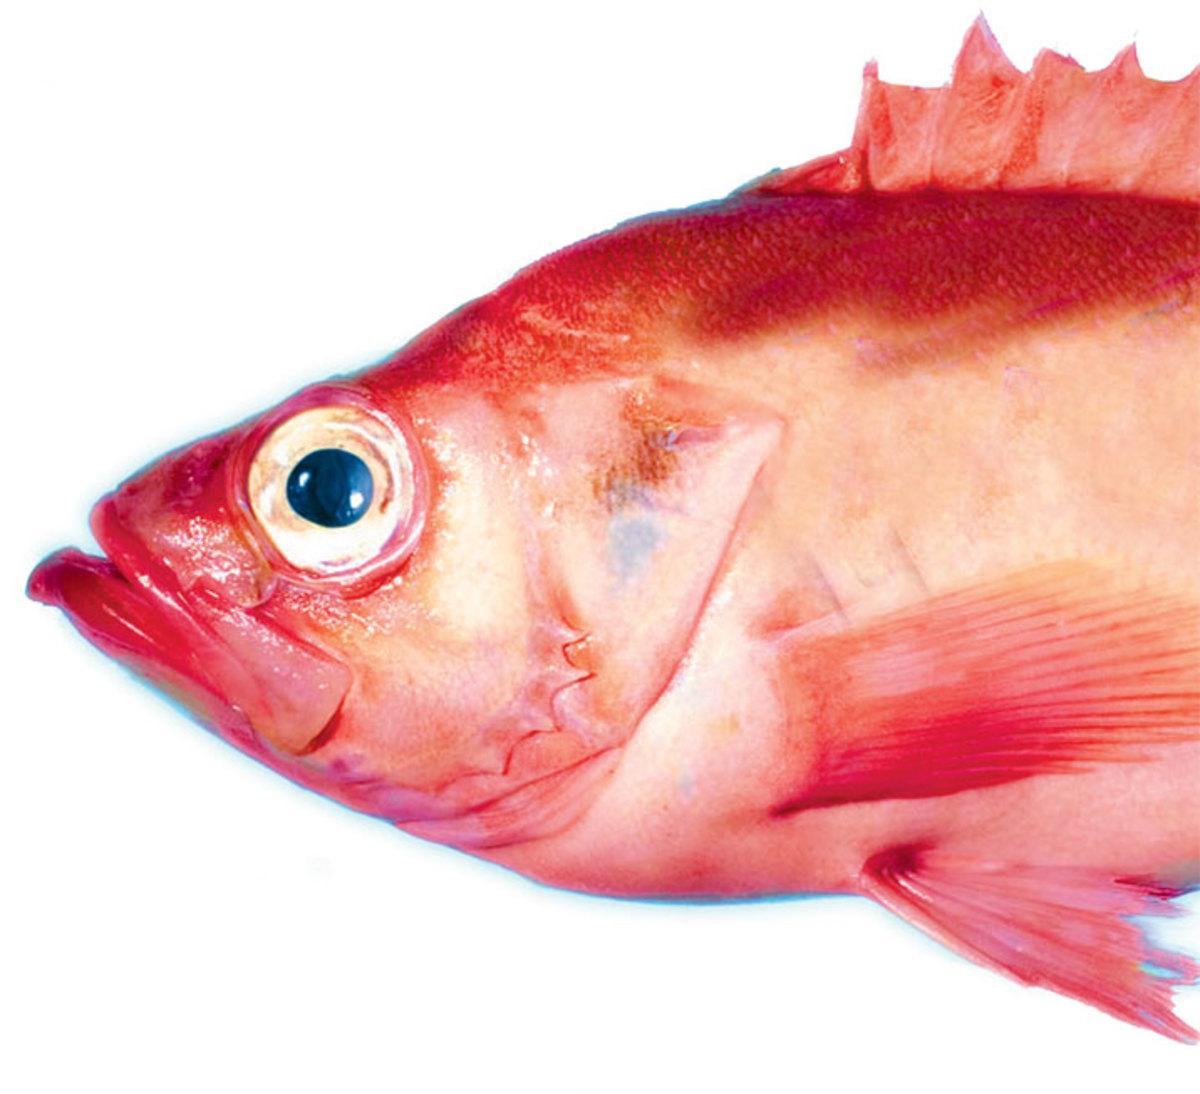 Red Herring literary plot device, not the fish